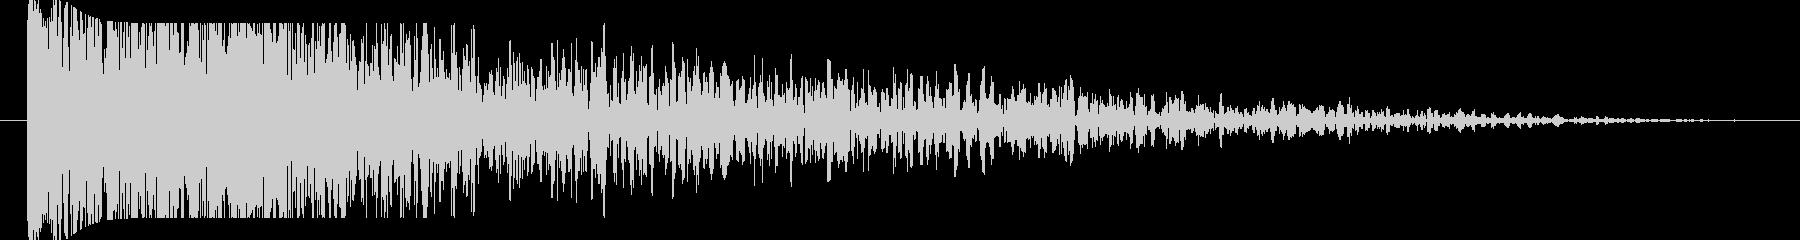 FX 大爆発01の未再生の波形